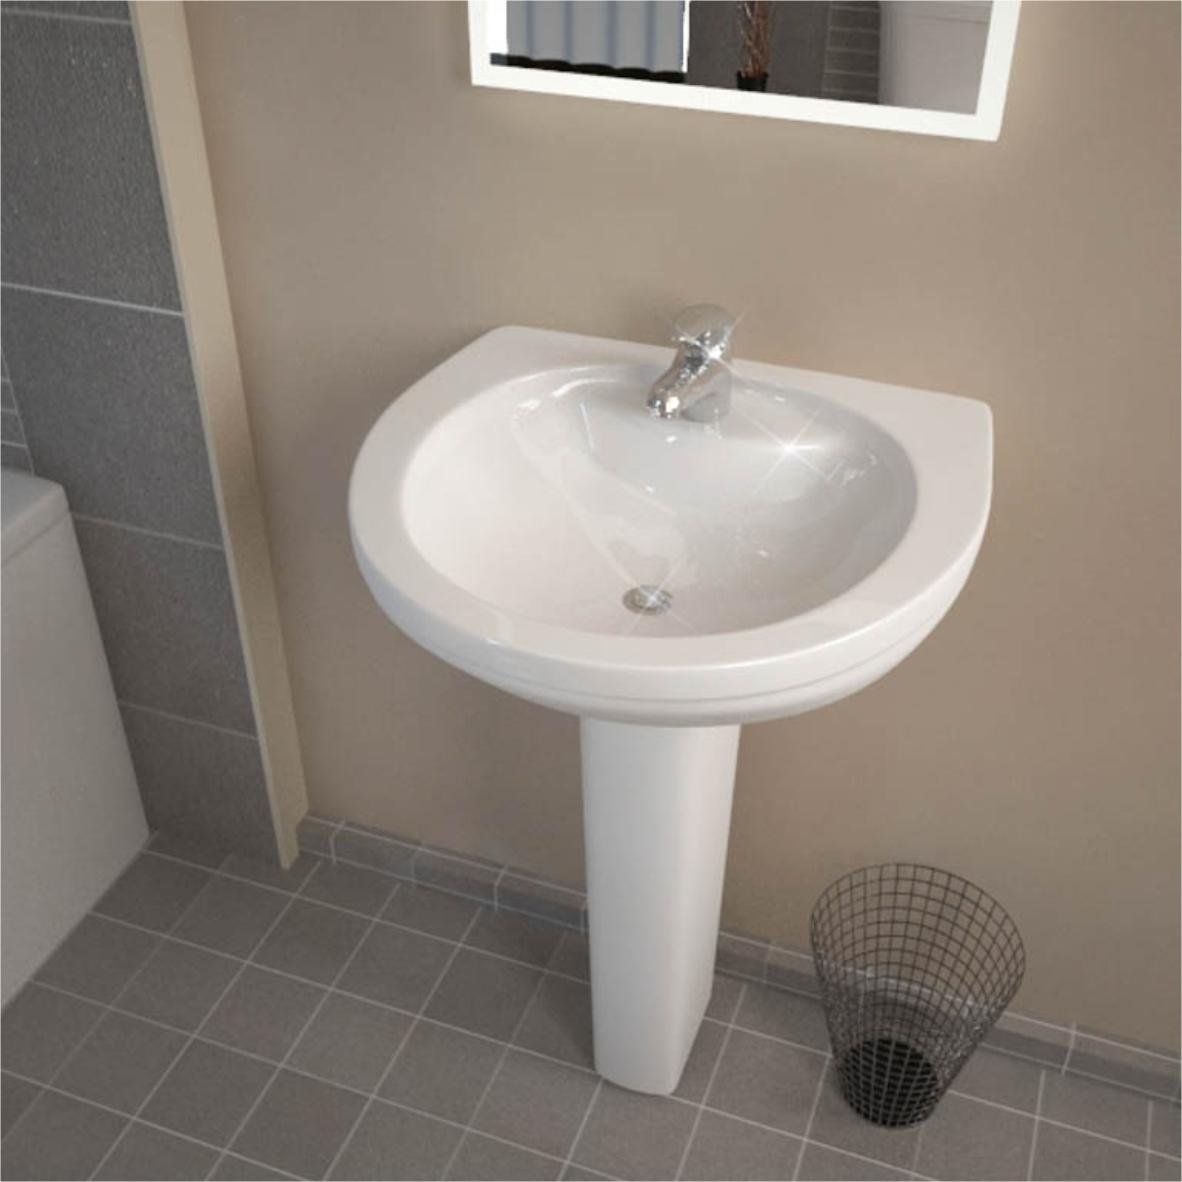 Bathroom 590 Large Basin And Pedestal Sale 49 Buy Online At Bathroom City